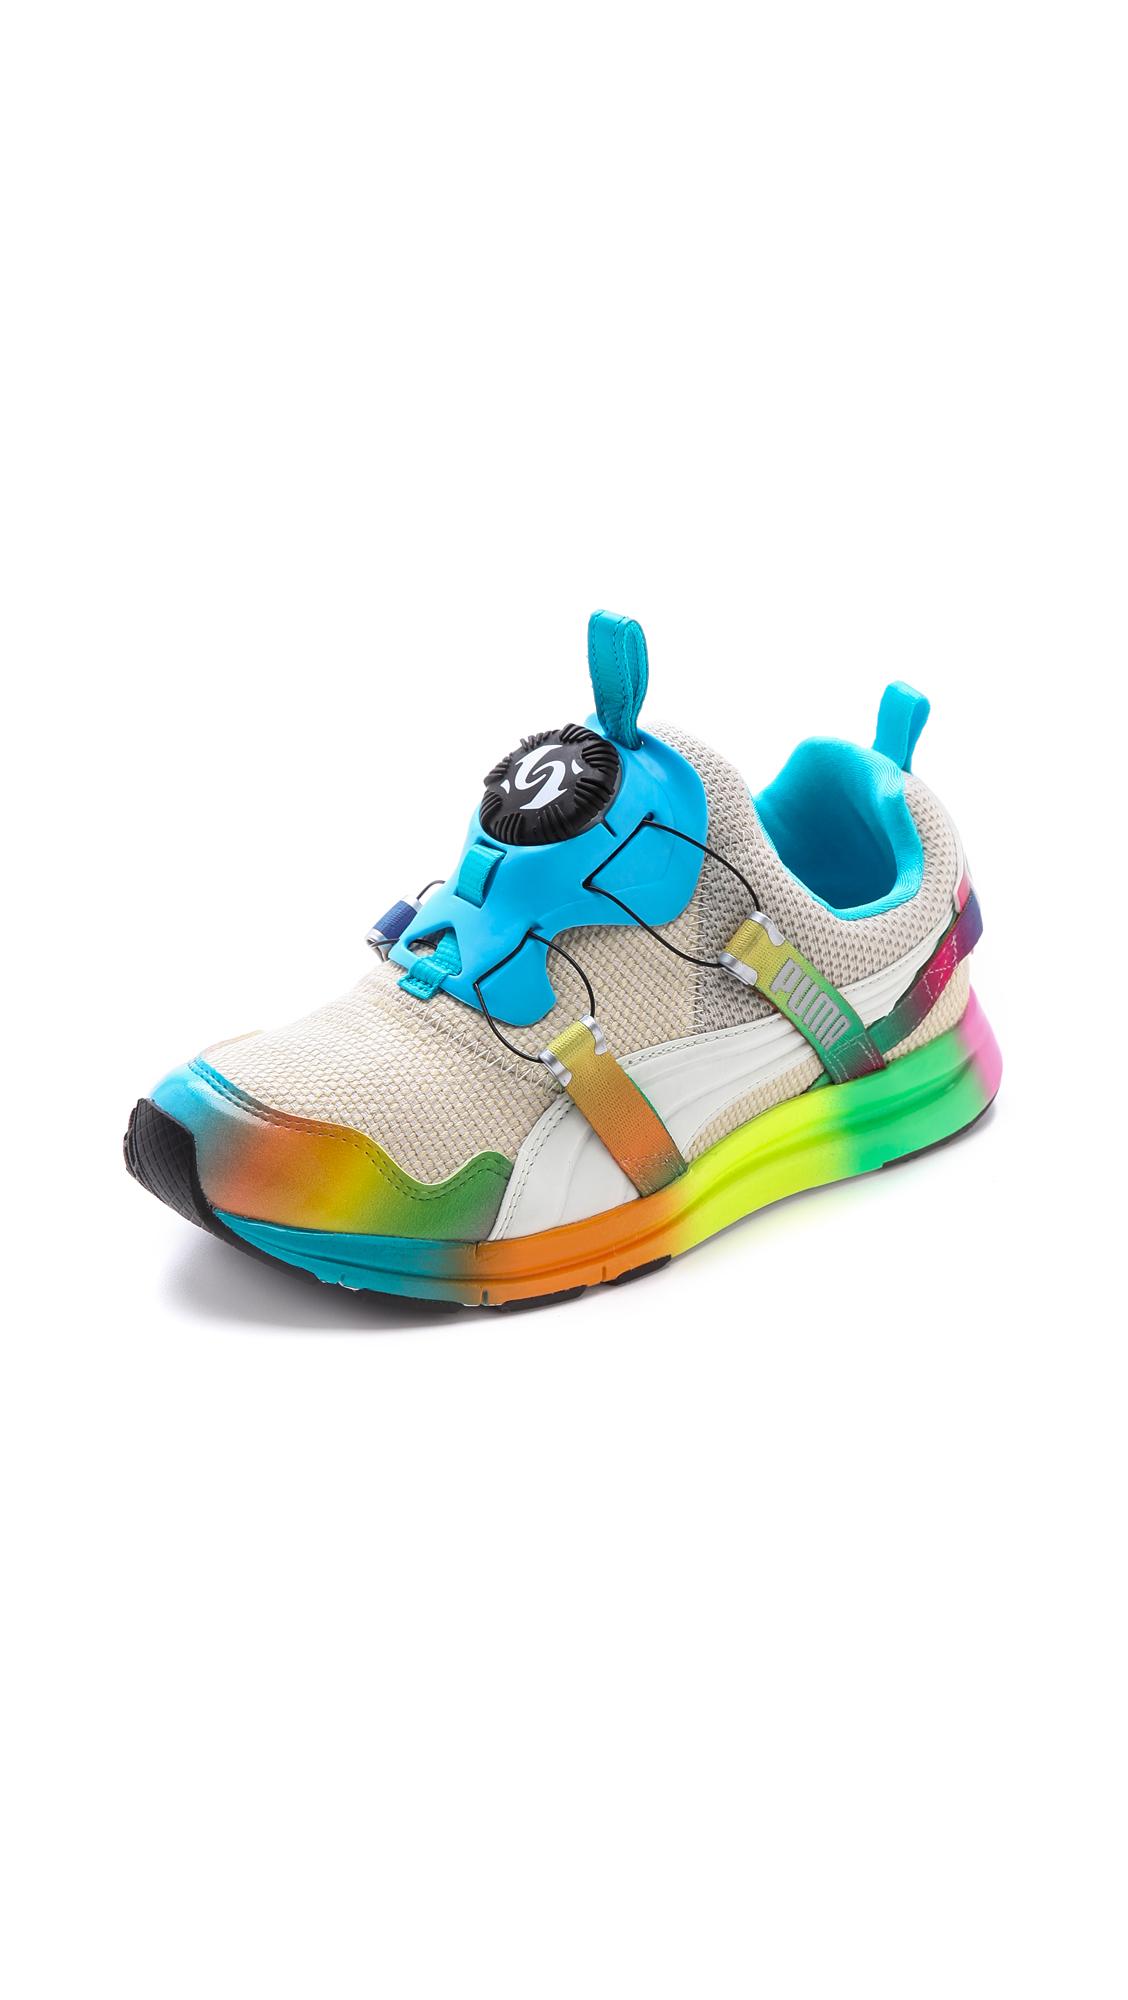 Solange New Shoes